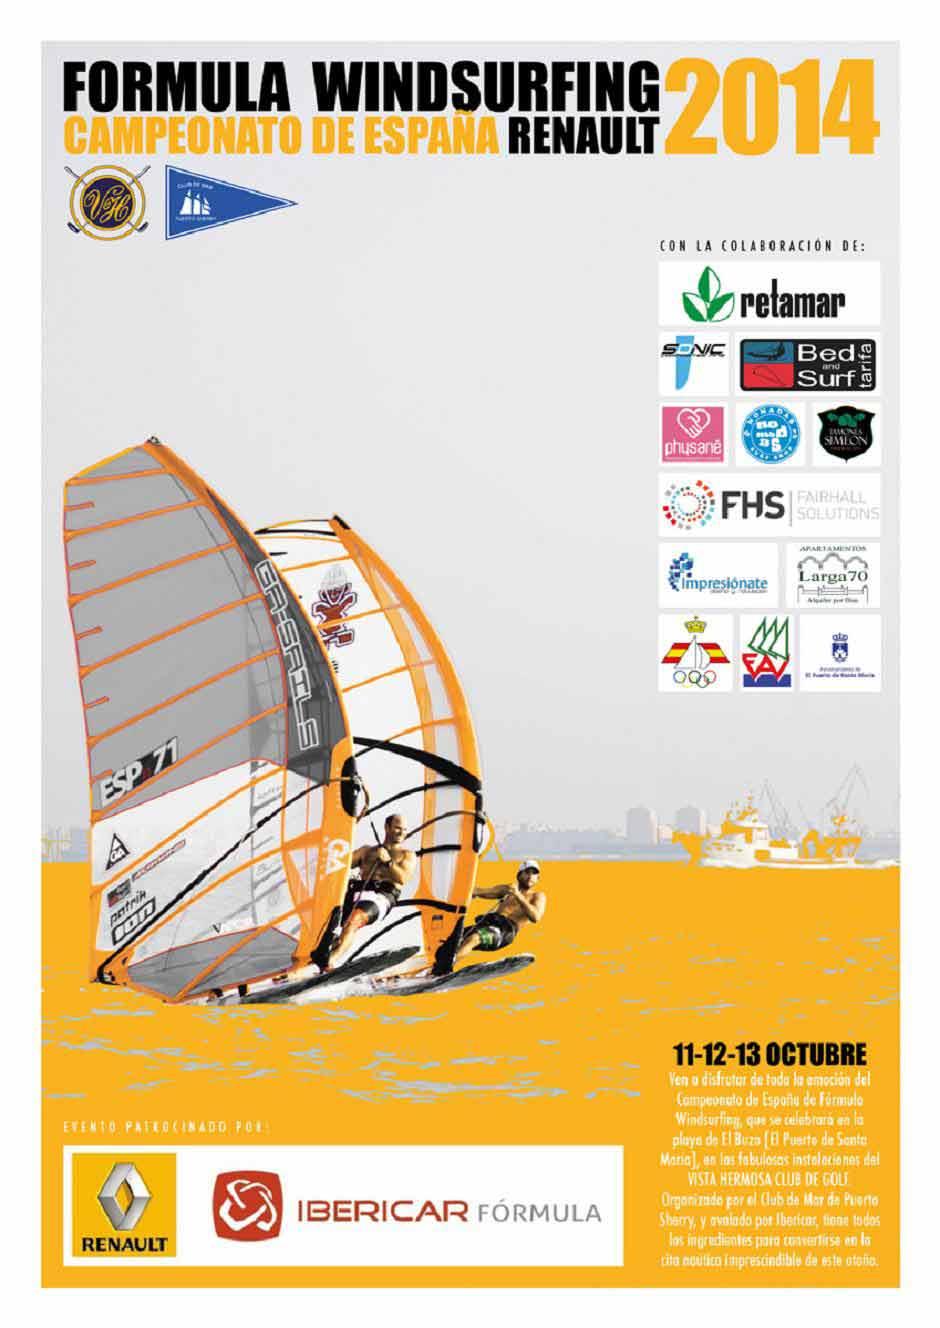 Windsurf Spain Championship El Puerto de Santa Maria